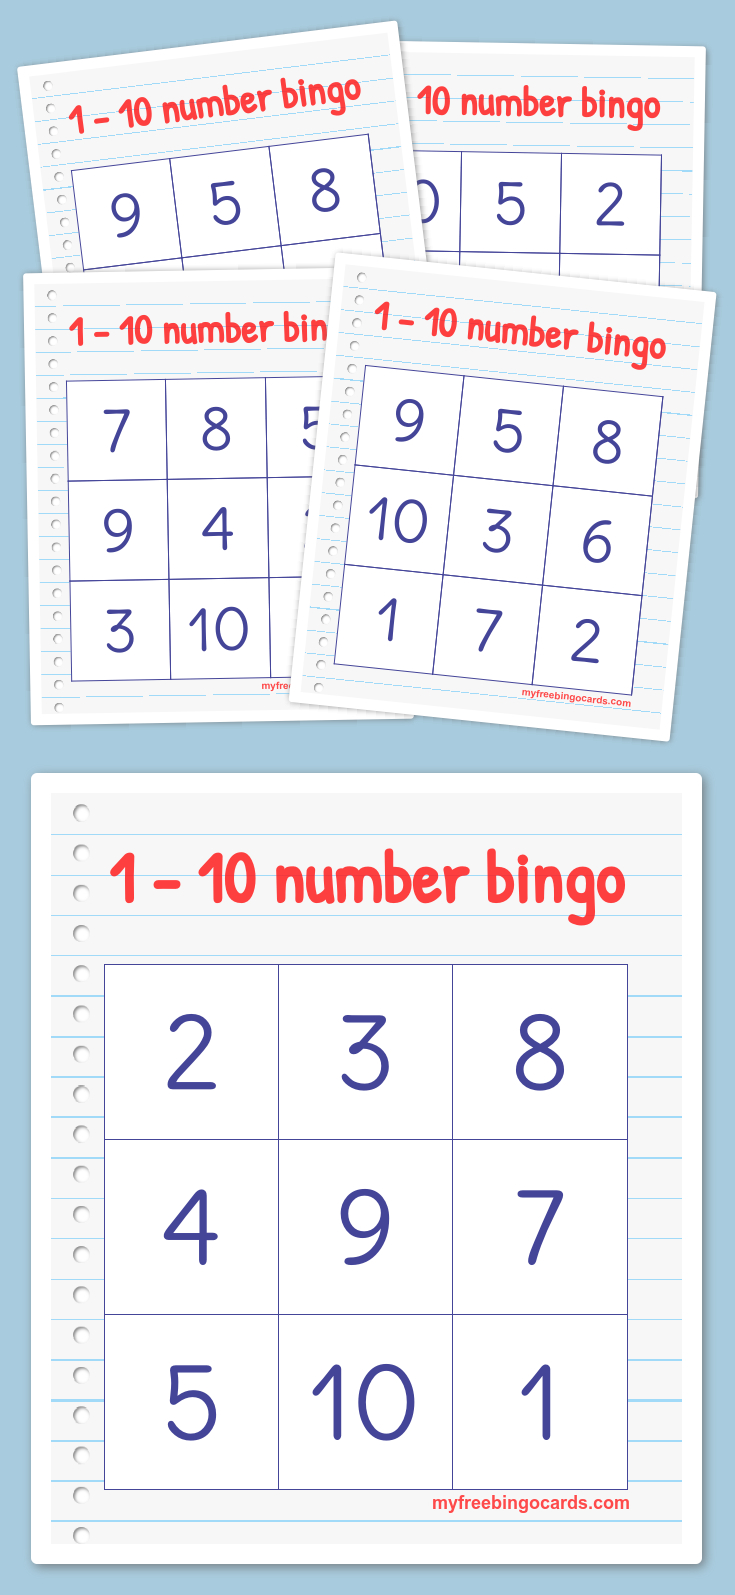 Free Printable Bingo Cards | Math | Kindergarten Math, Preschool - Free Printable Bingo Cards With Numbers